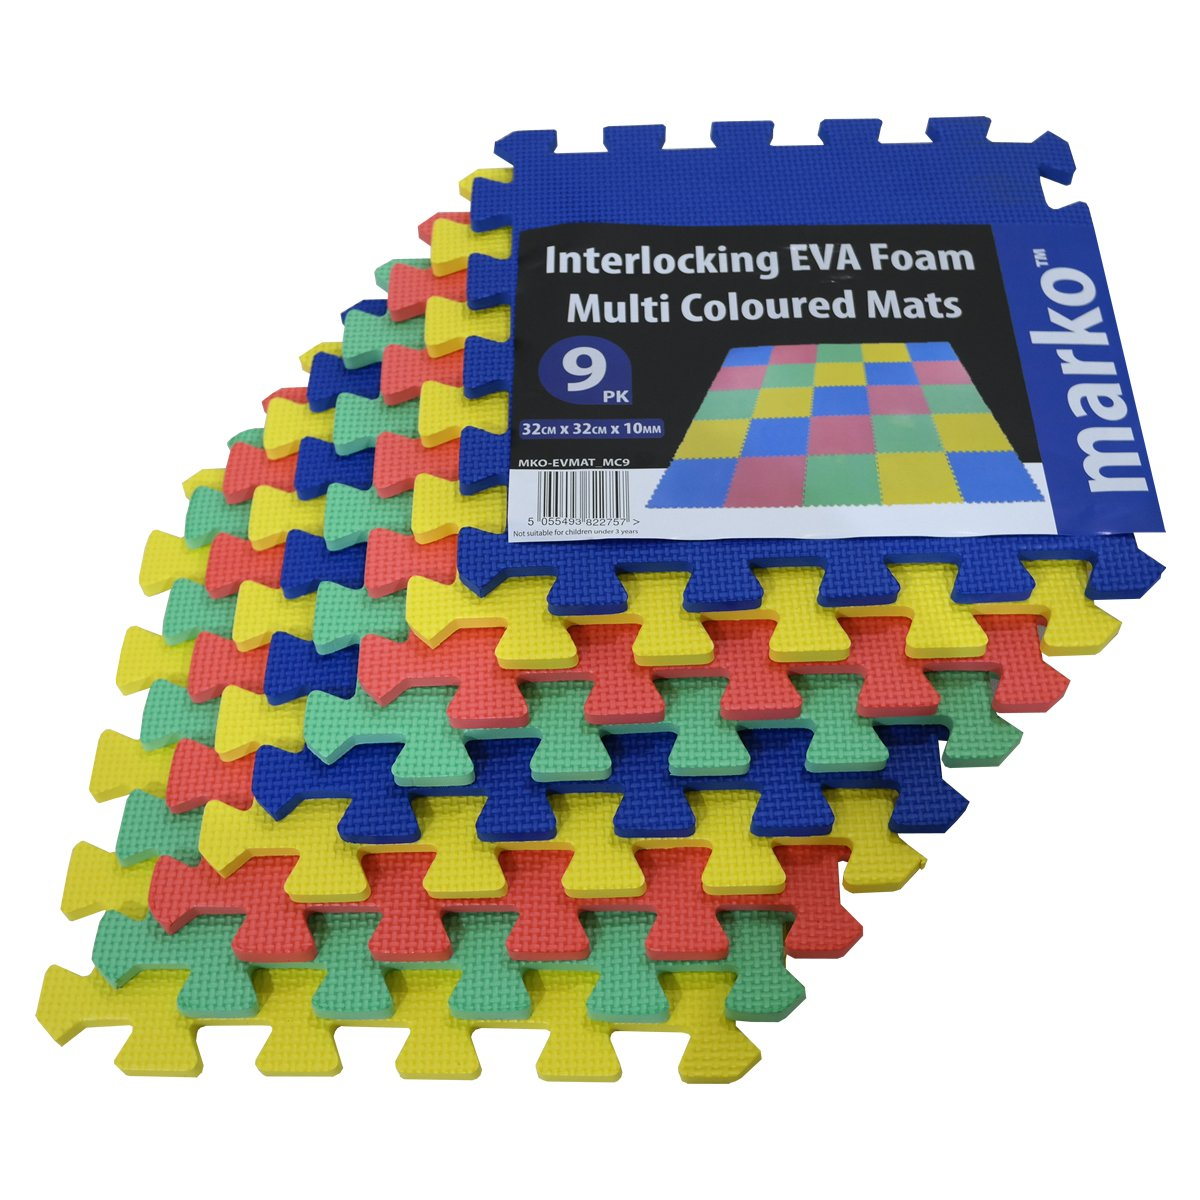 100 SQ FT / 9.2M² / 90 Pack Interlocking EVA MultiColoured Soft Foam Baby Child Play Area Yoga Exercise Mats Marko